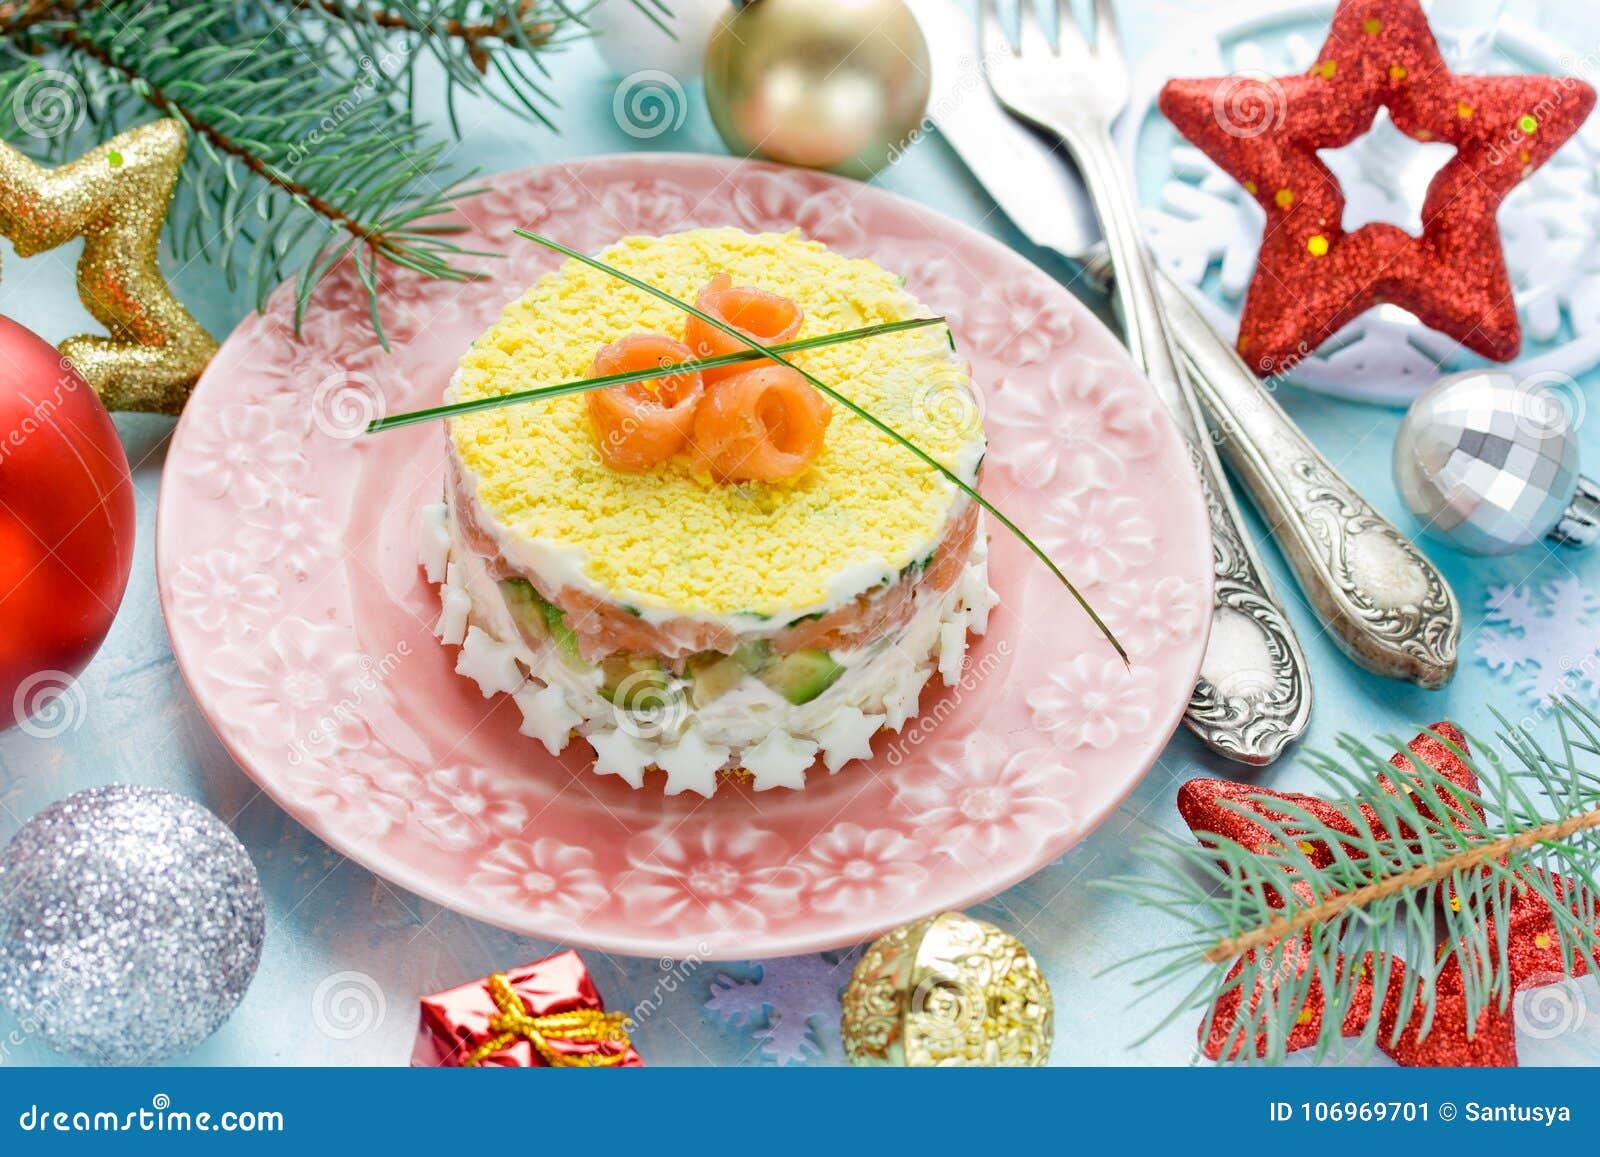 New tasty salads - festive table decoration 88